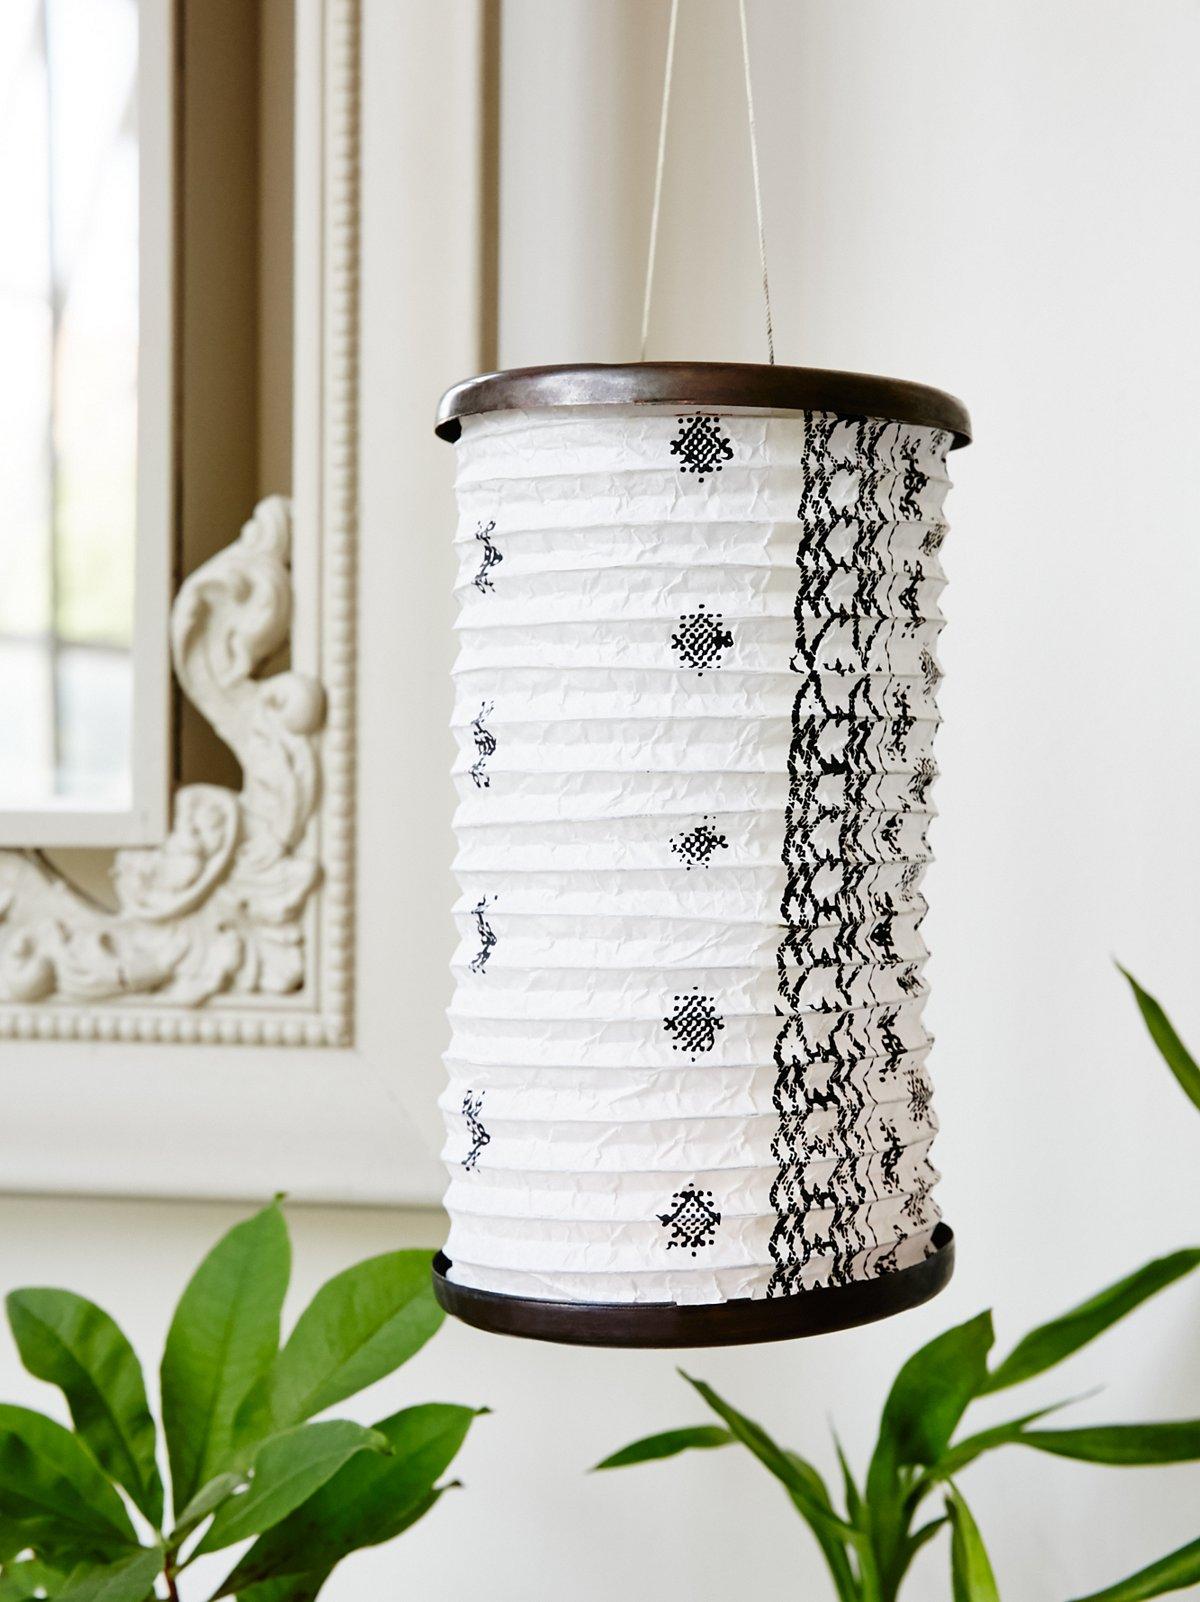 FP One Paper Lantern